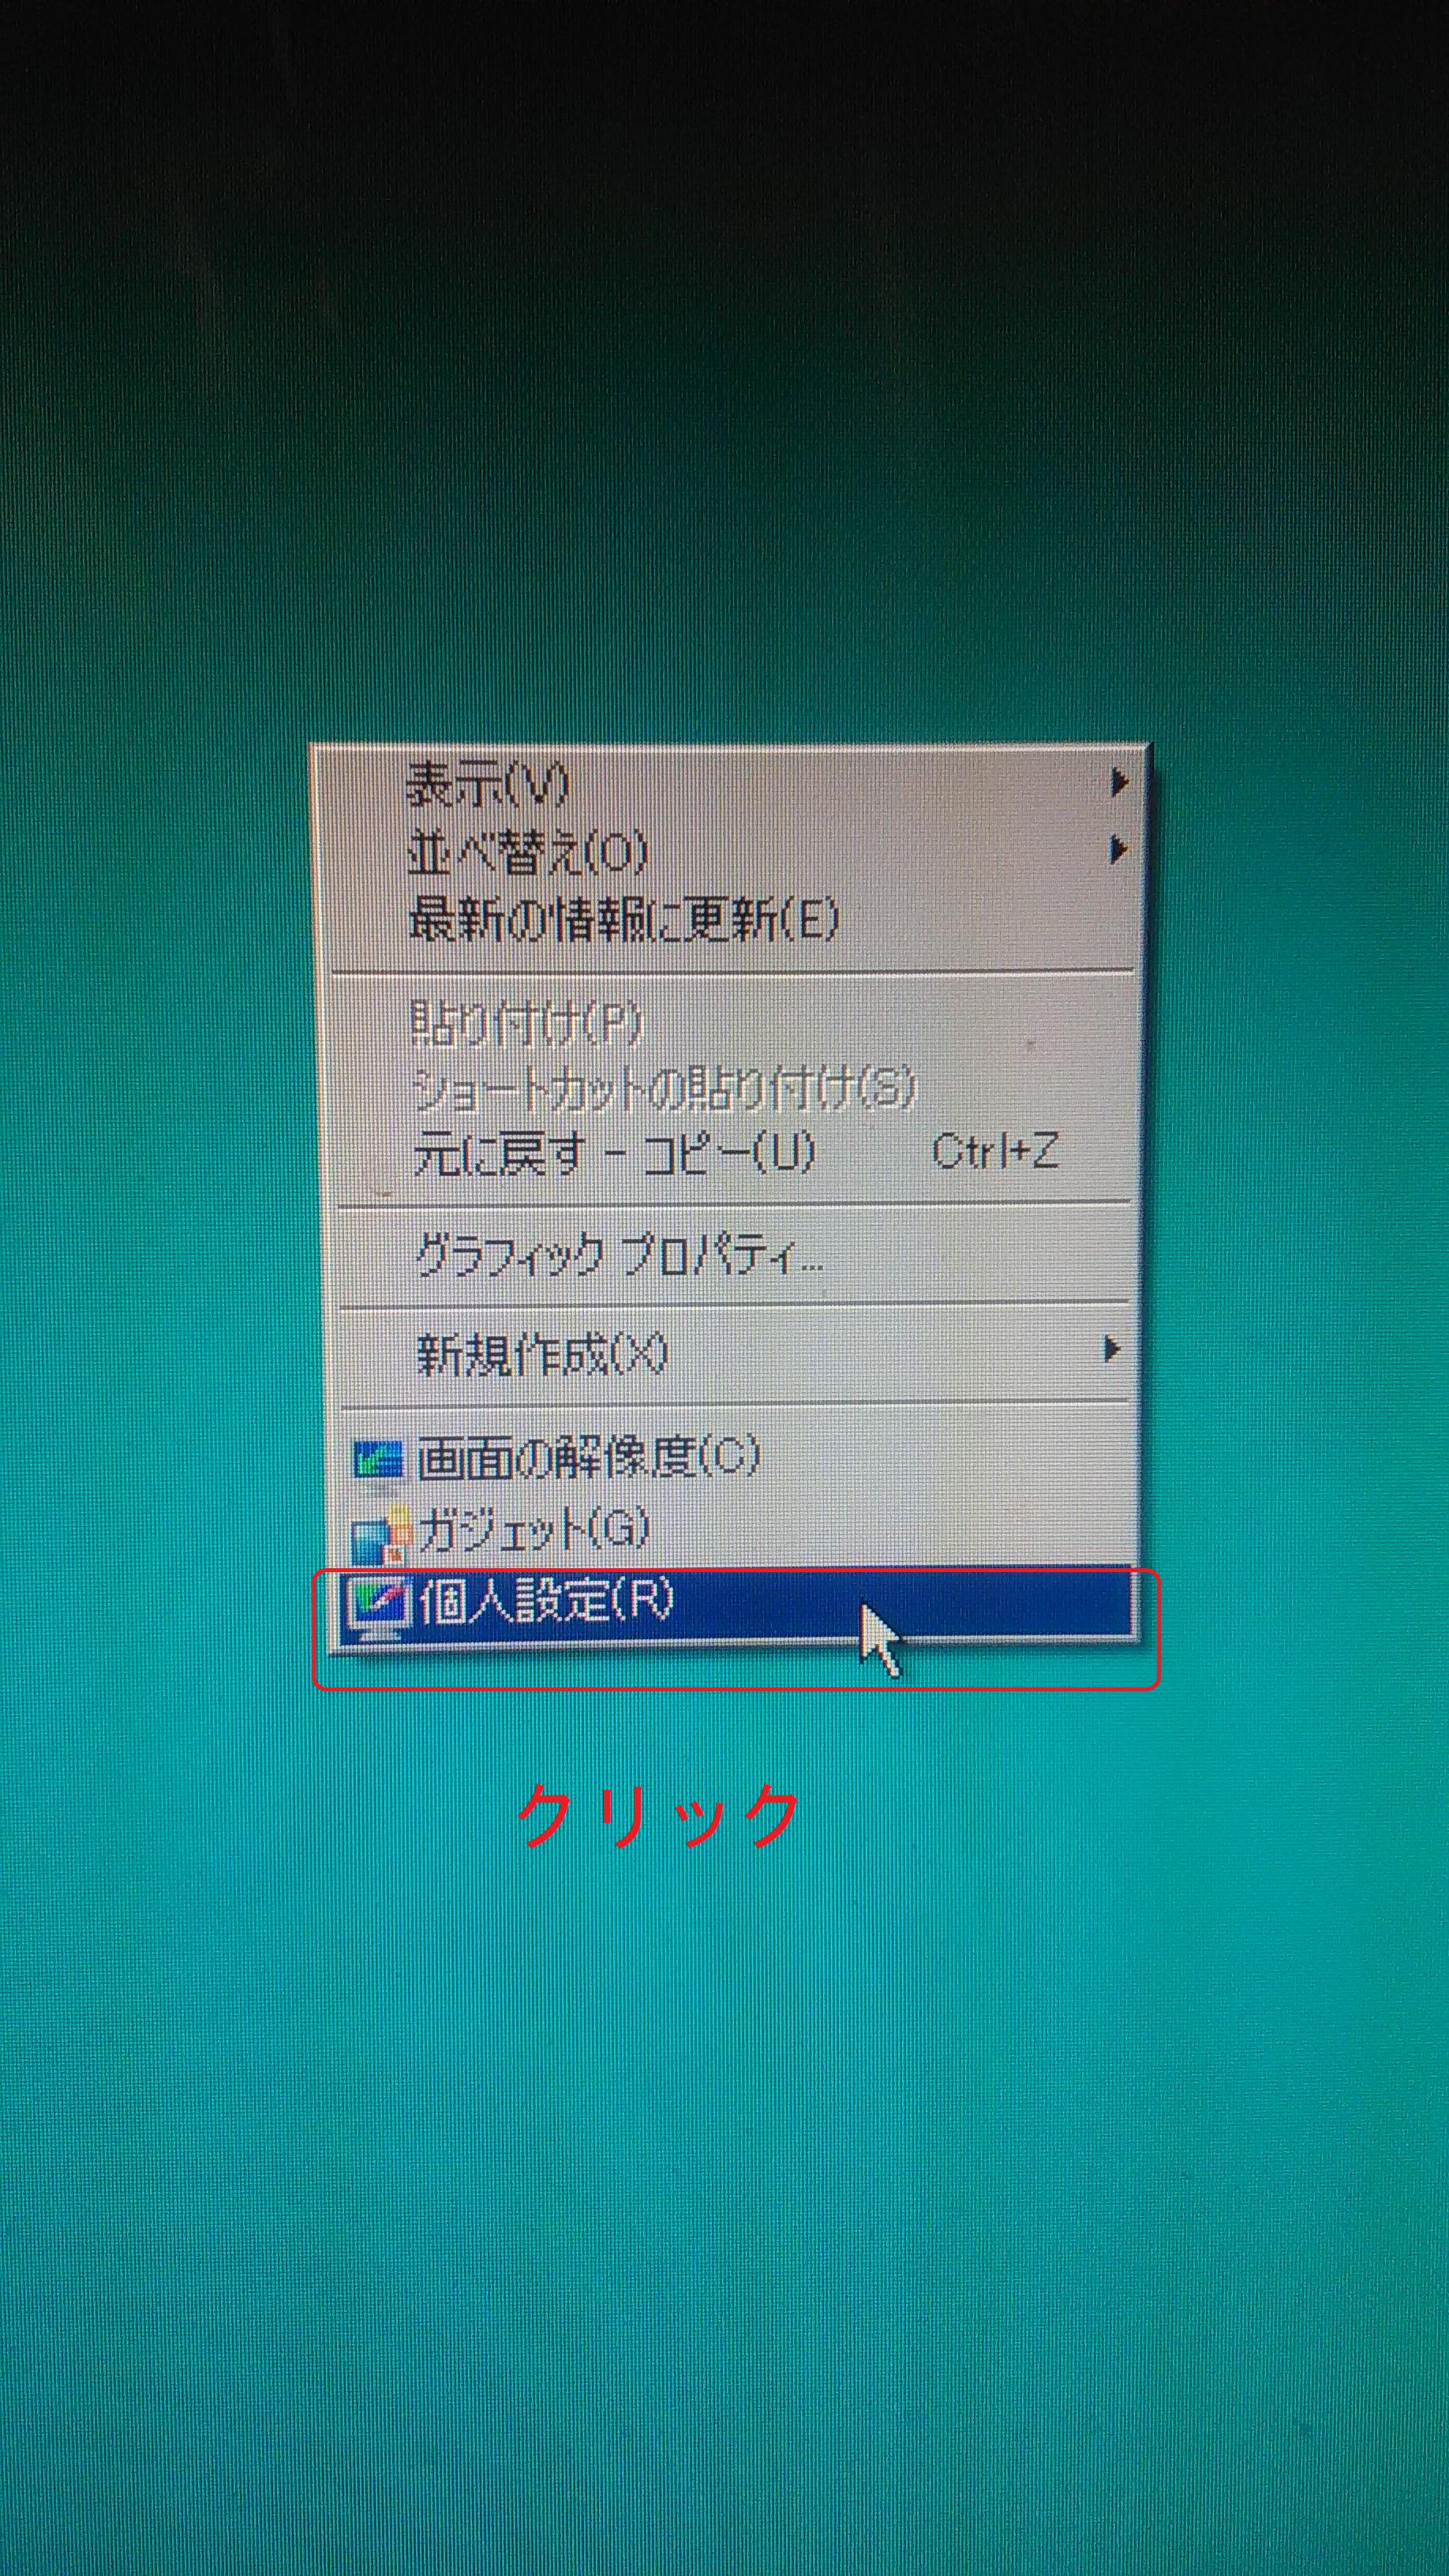 Windows7のデスクトップの壁紙の変更方法 Pcの背景画像の変え方を解説